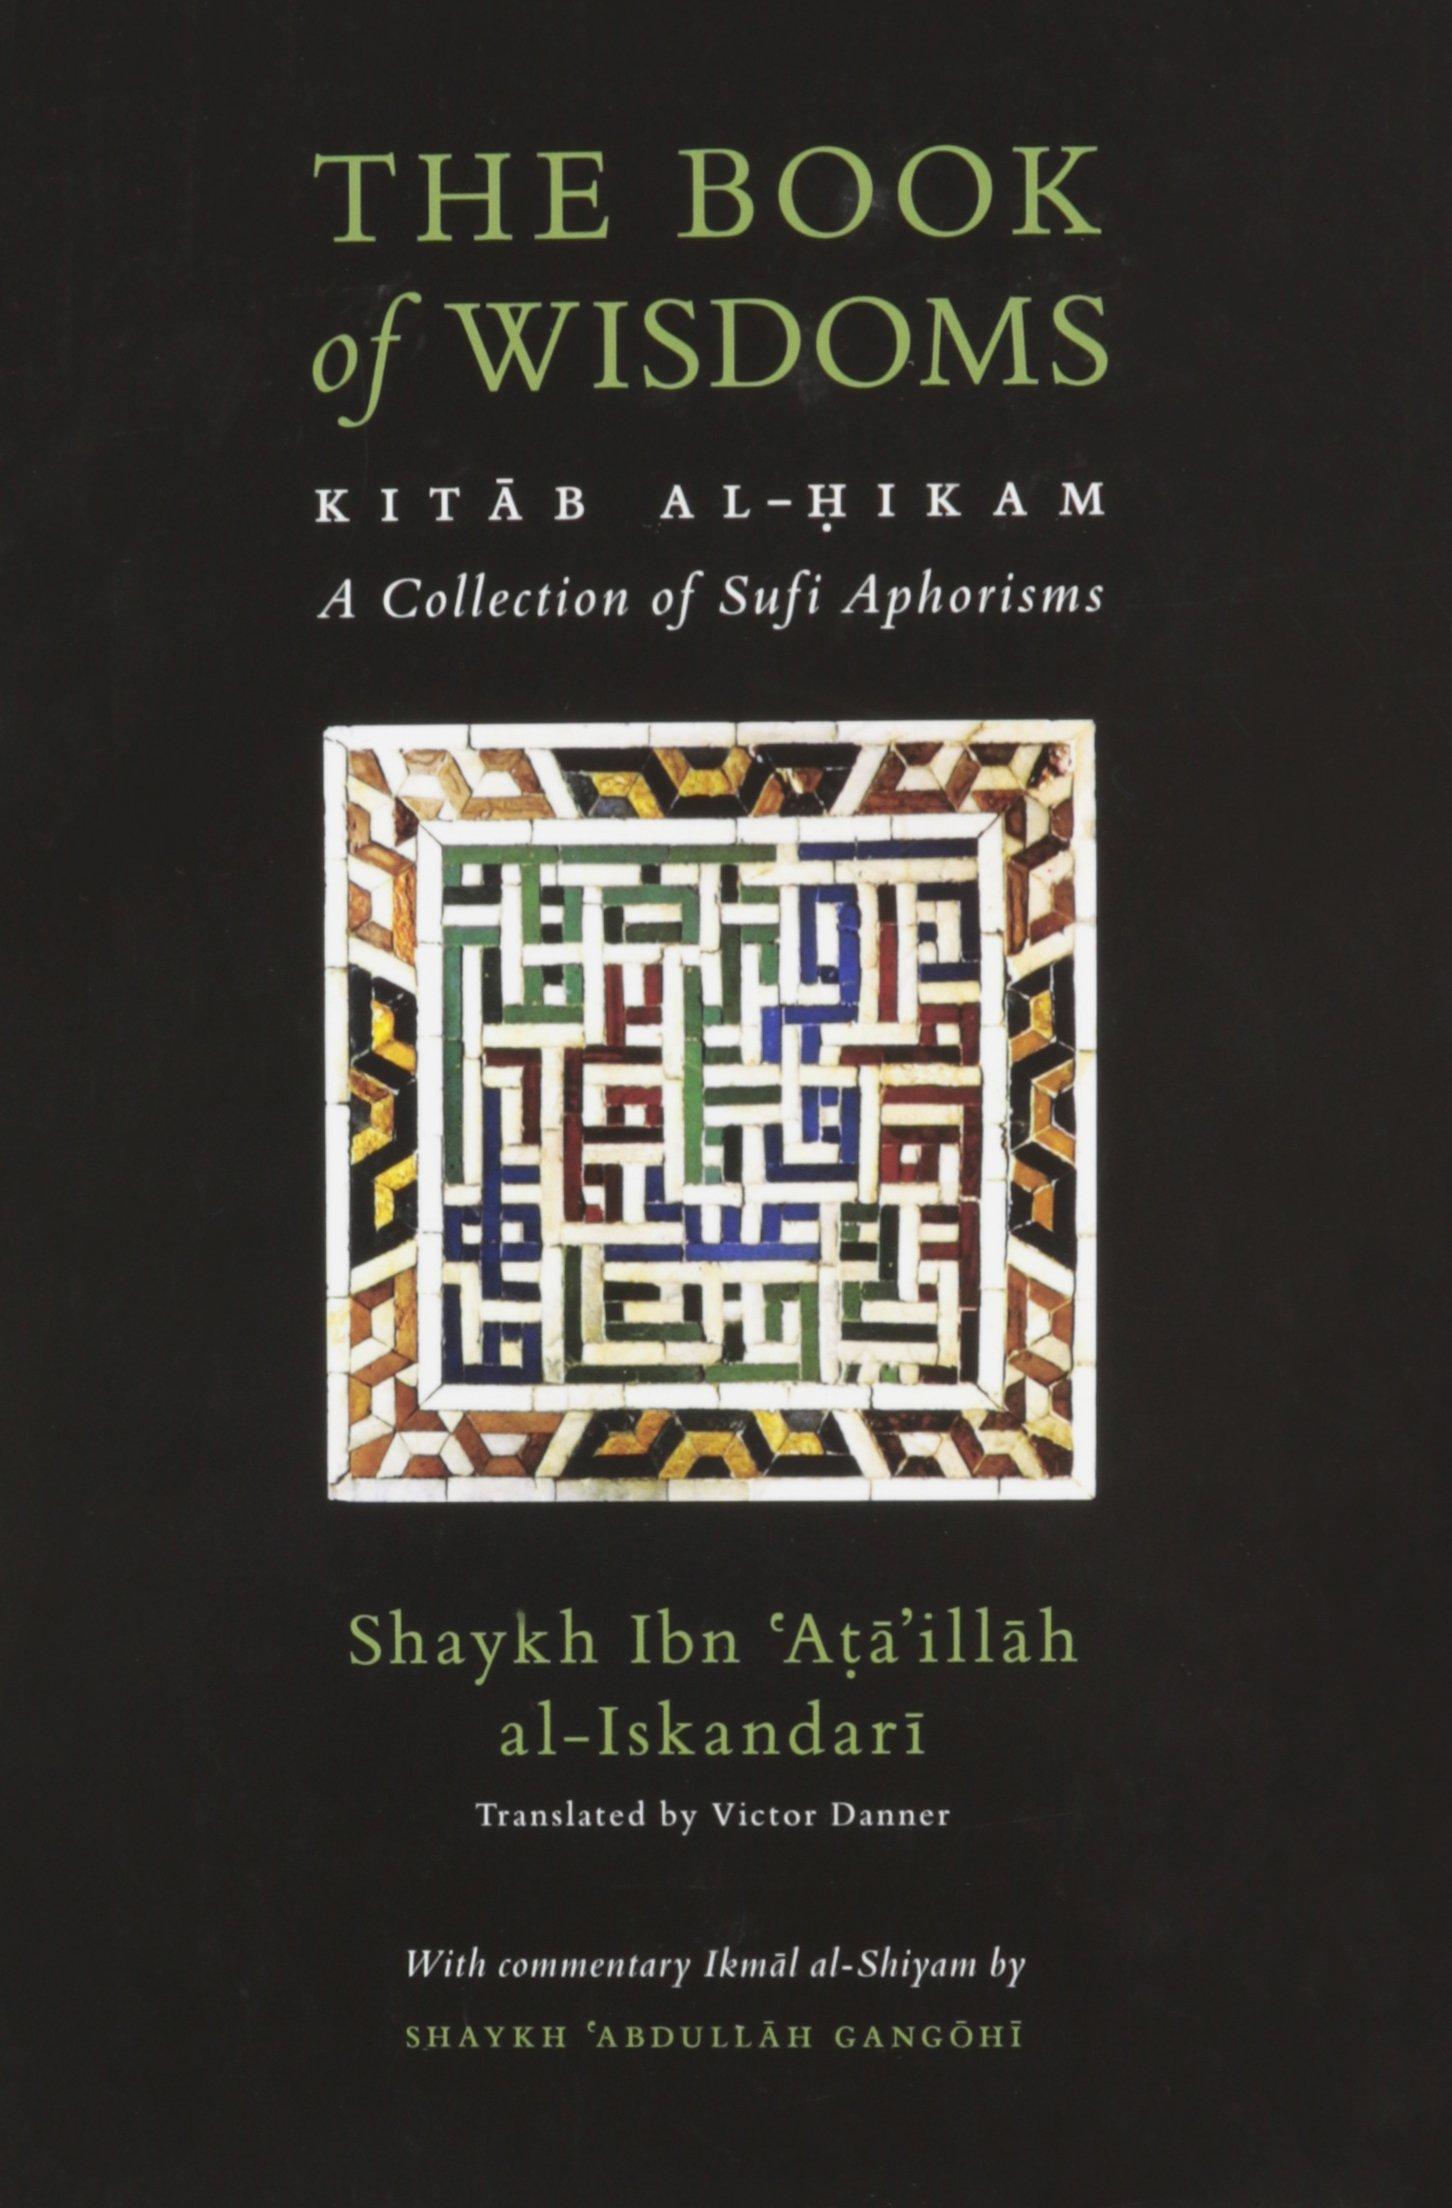 FREE KITAB AL HIKAM PDF VIEWER DOWNLOAD